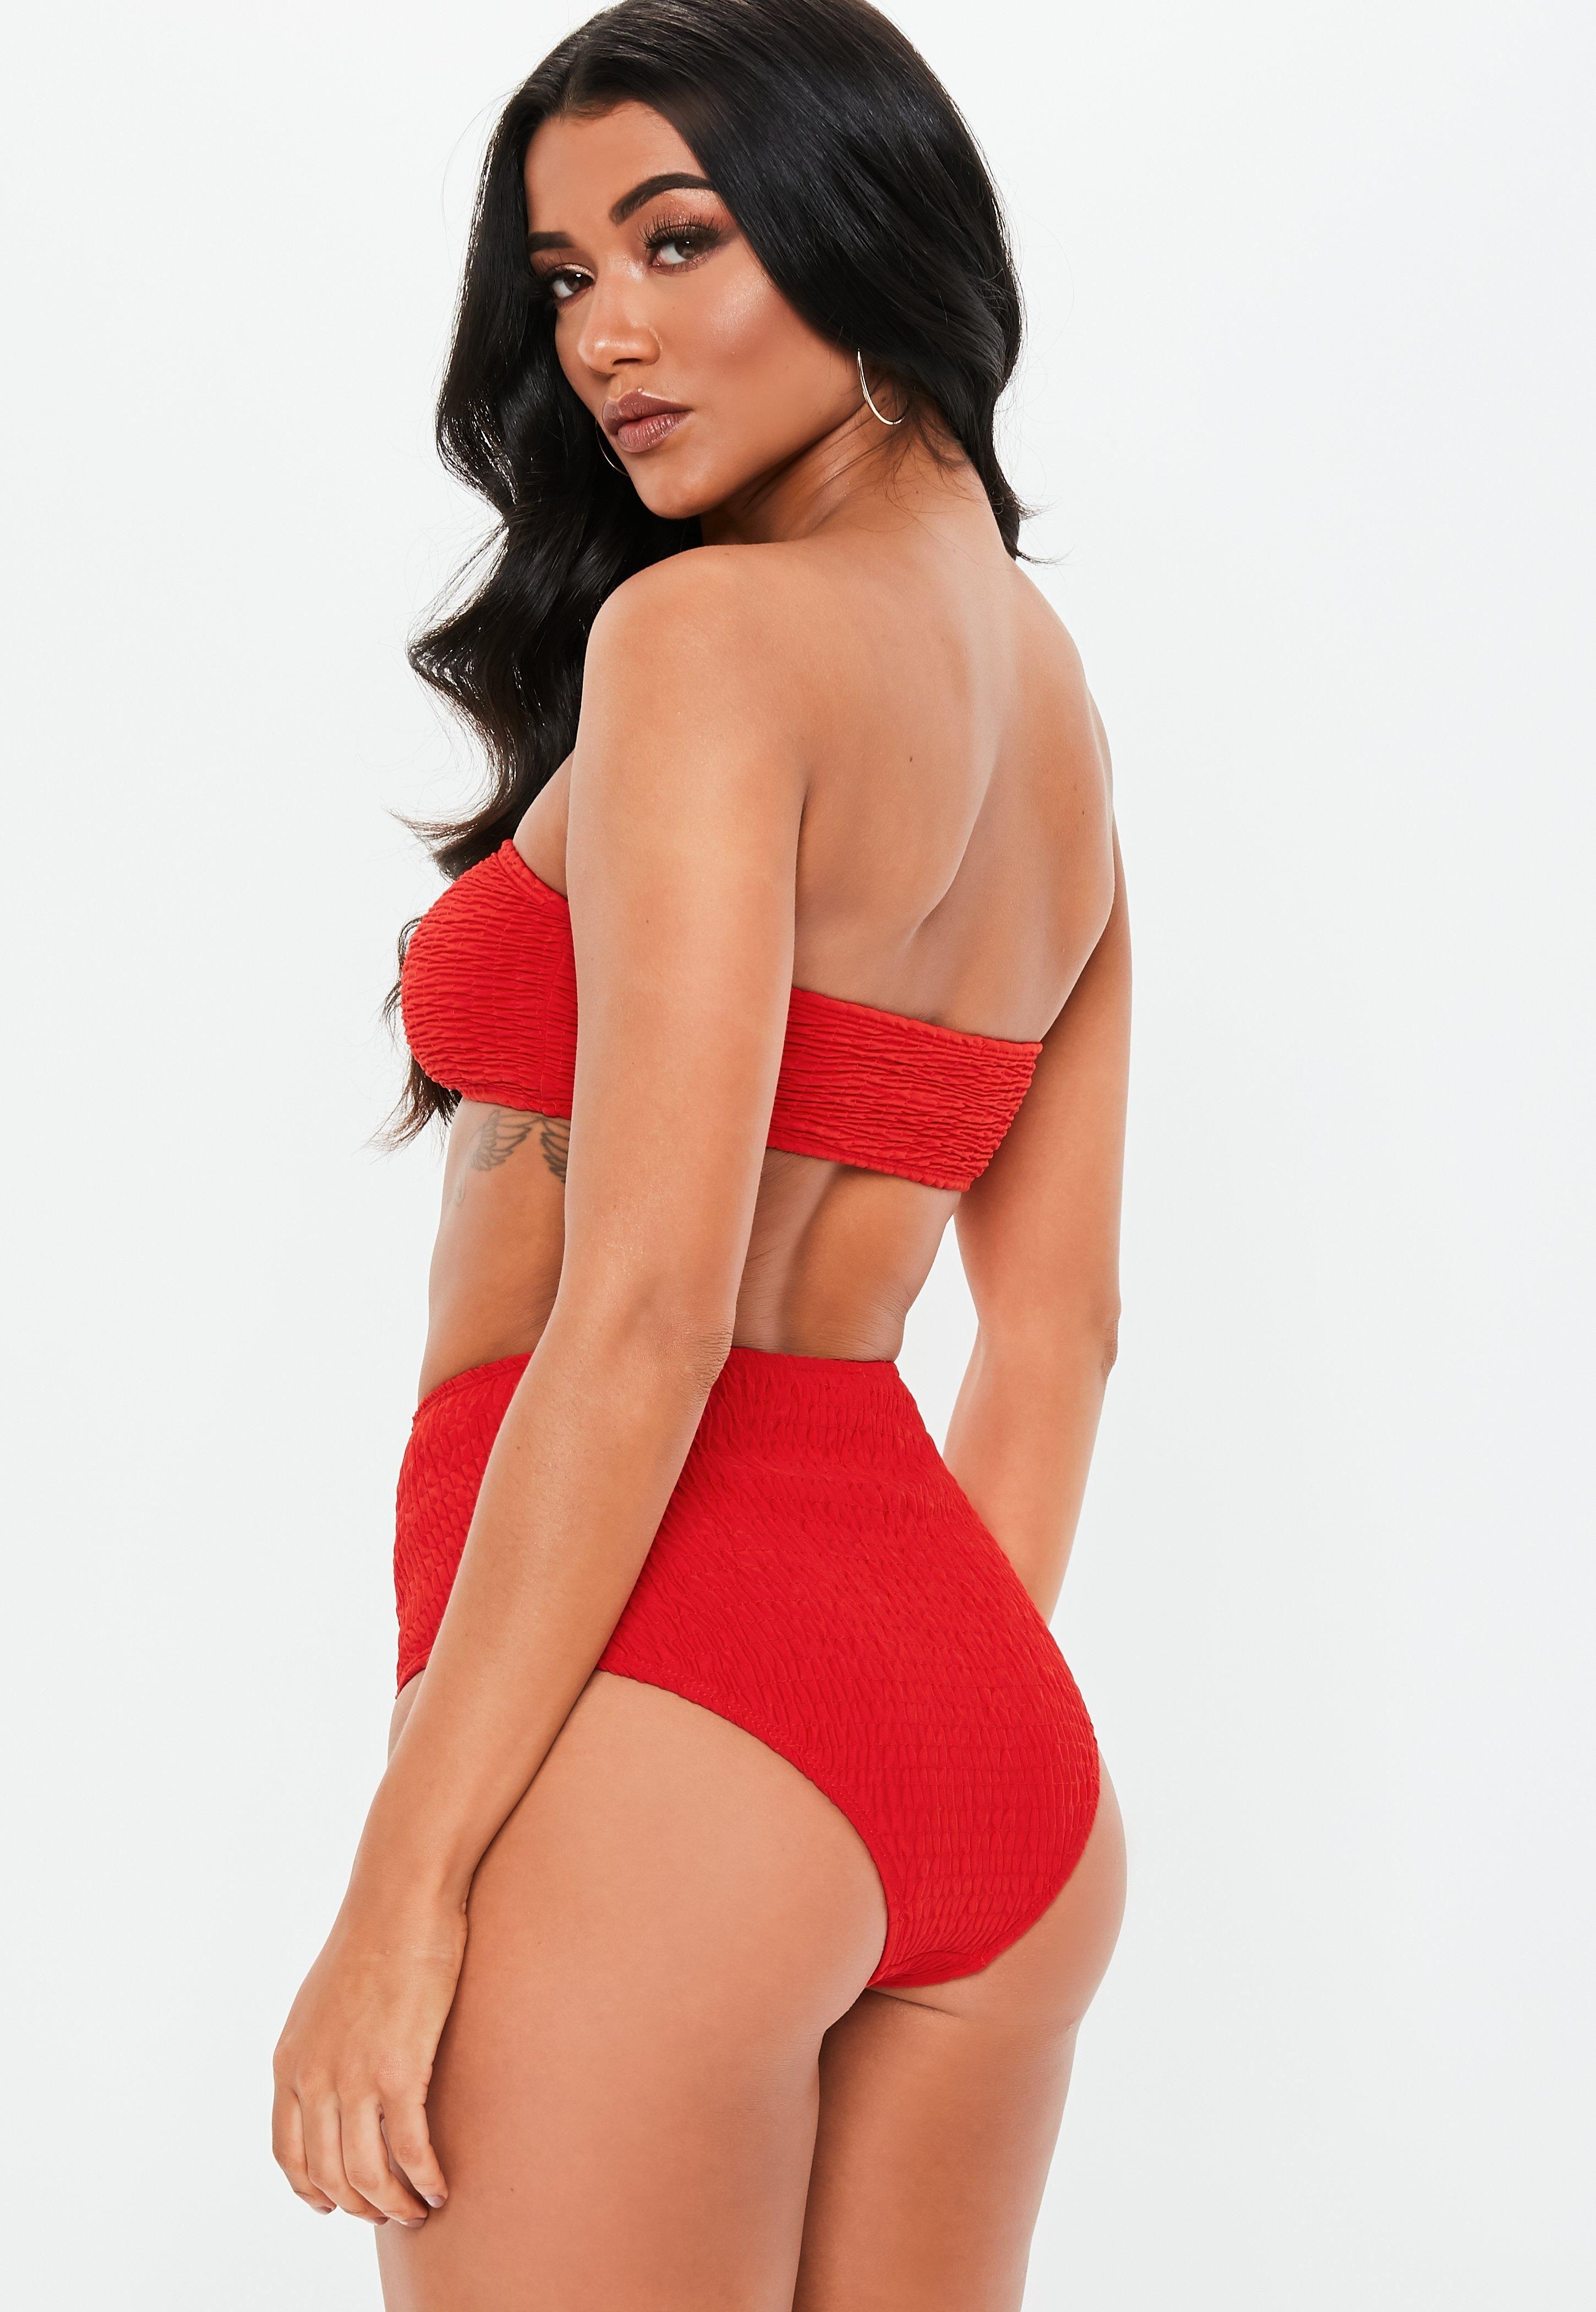 555aa223d75 Red Crinkle Mix and Match Bandeau Bikini Top #Sponsored #Mix, #SPONSORED,  #Crinkle, #Red